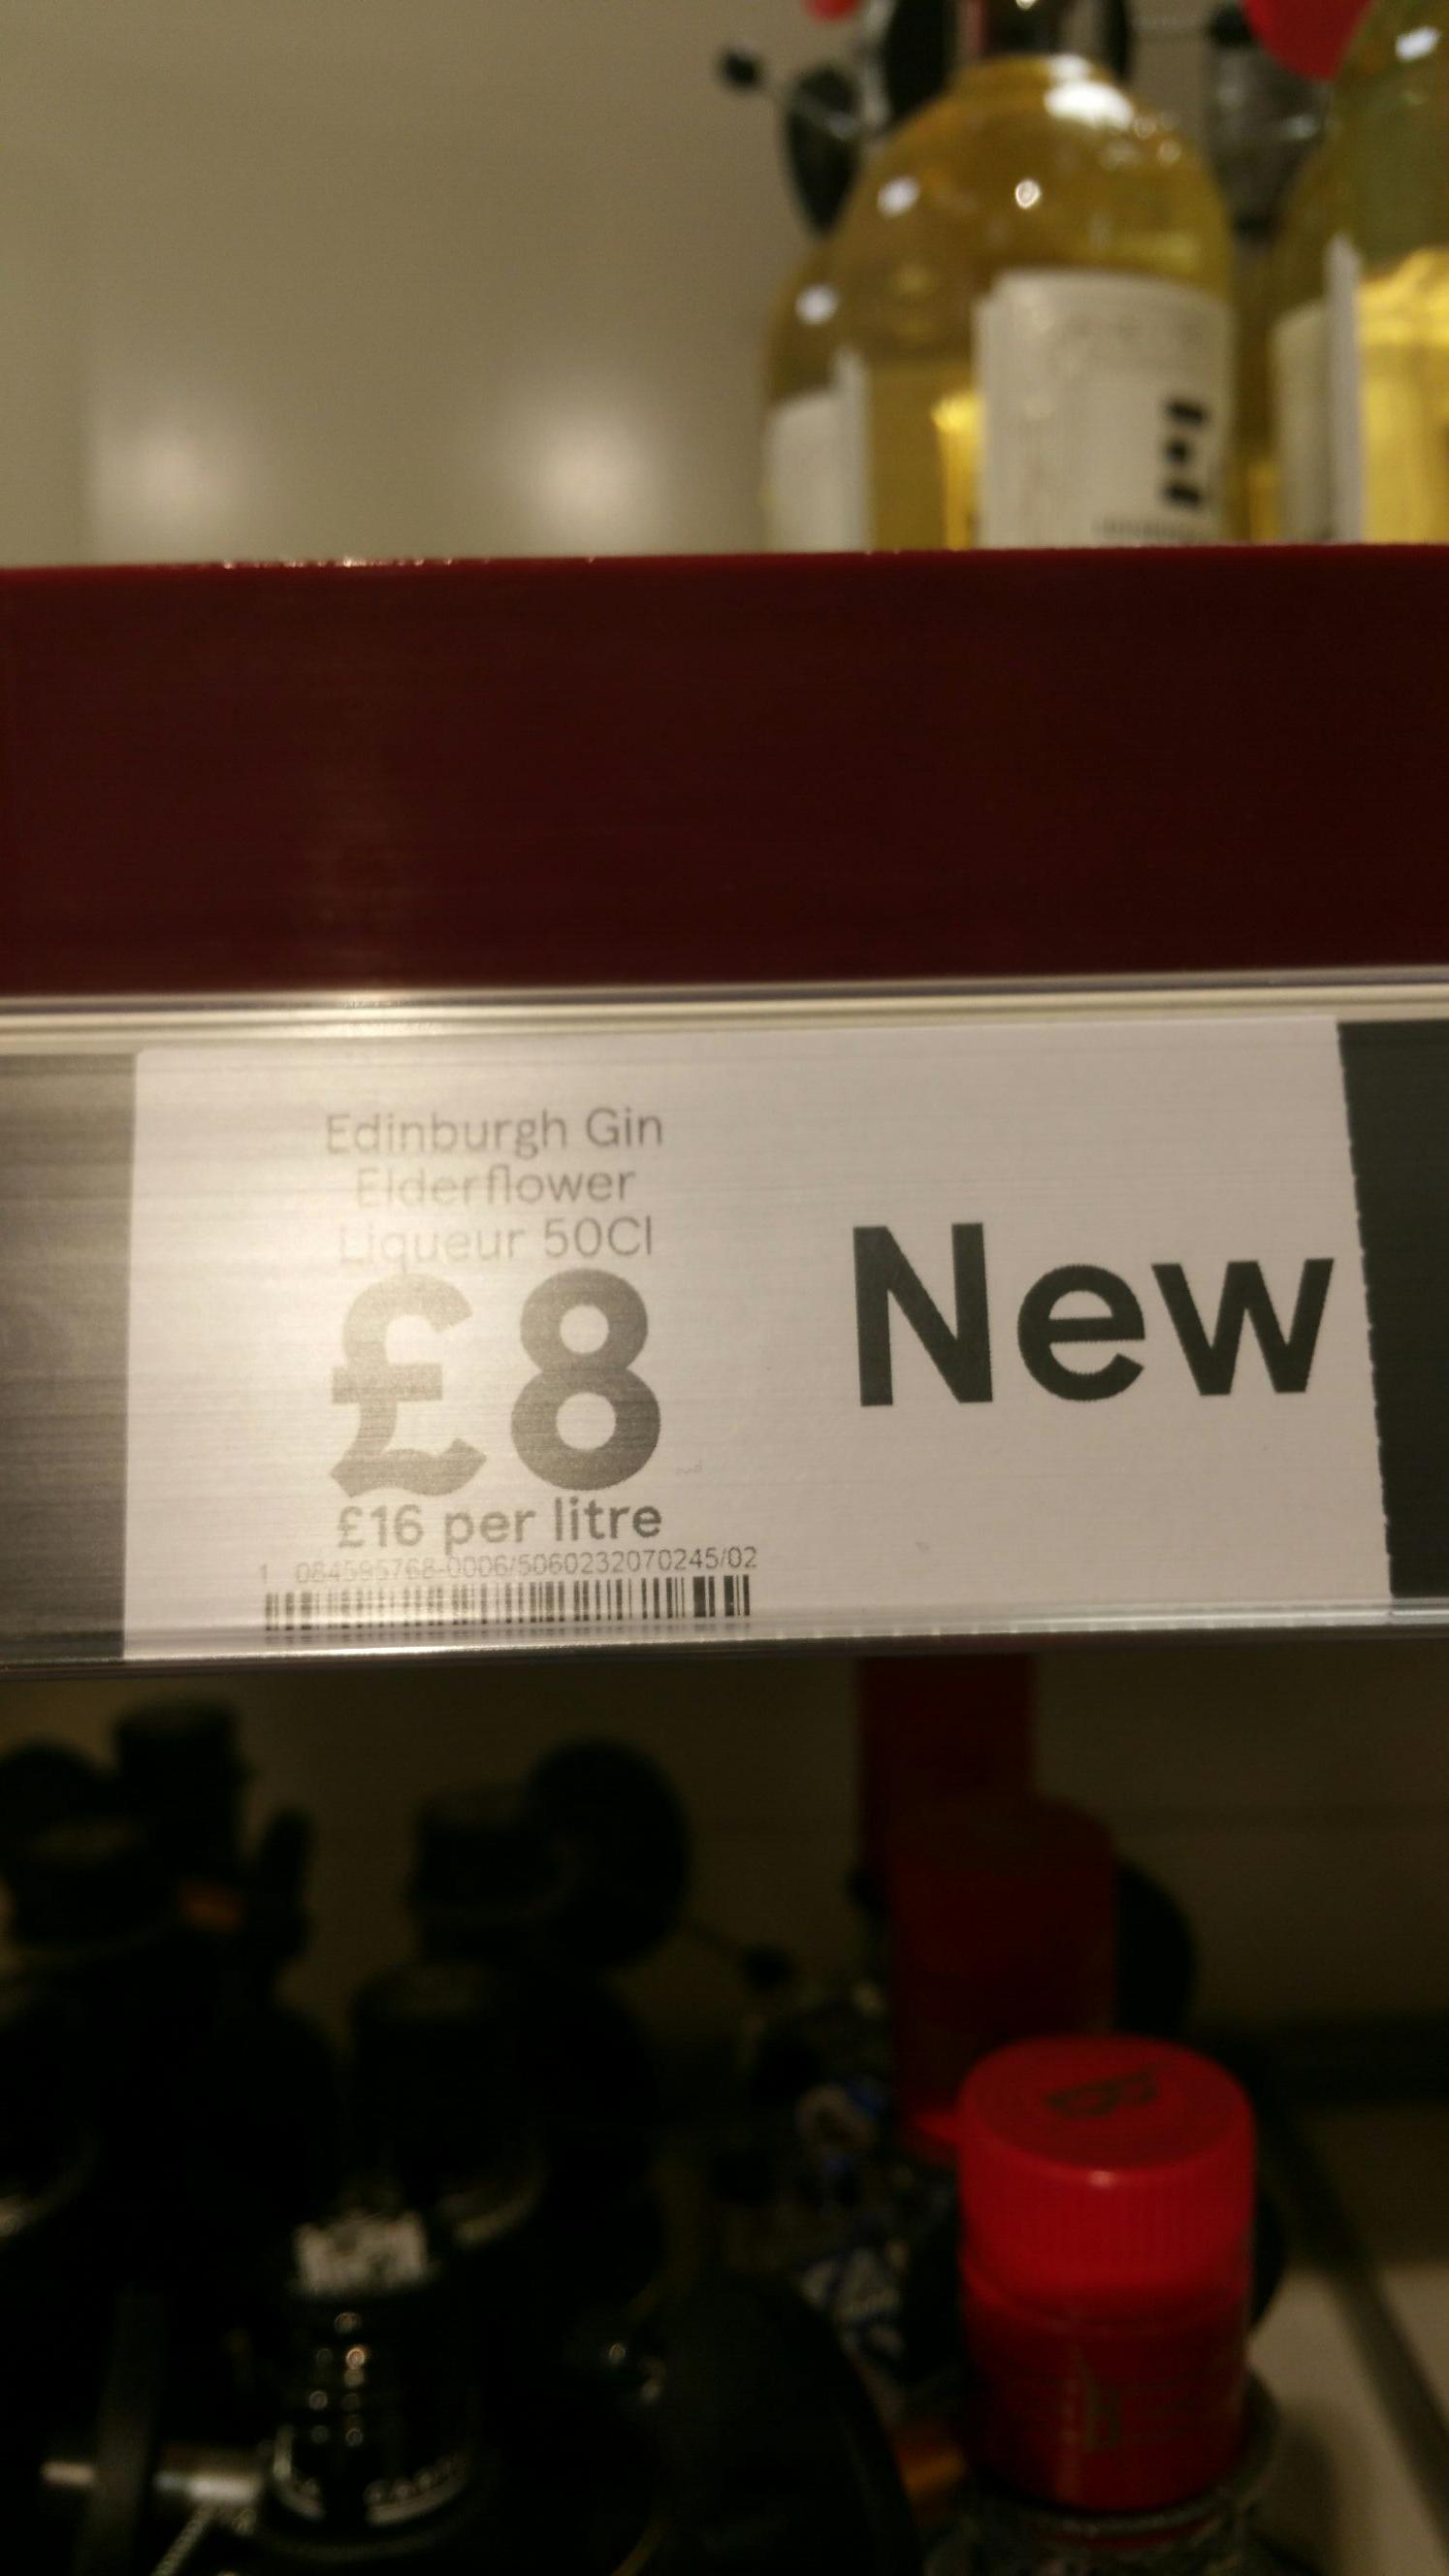 Edinburgh Gin Elderflower Liqueur 50Cl £8 @ Tesco (Aylesbury)